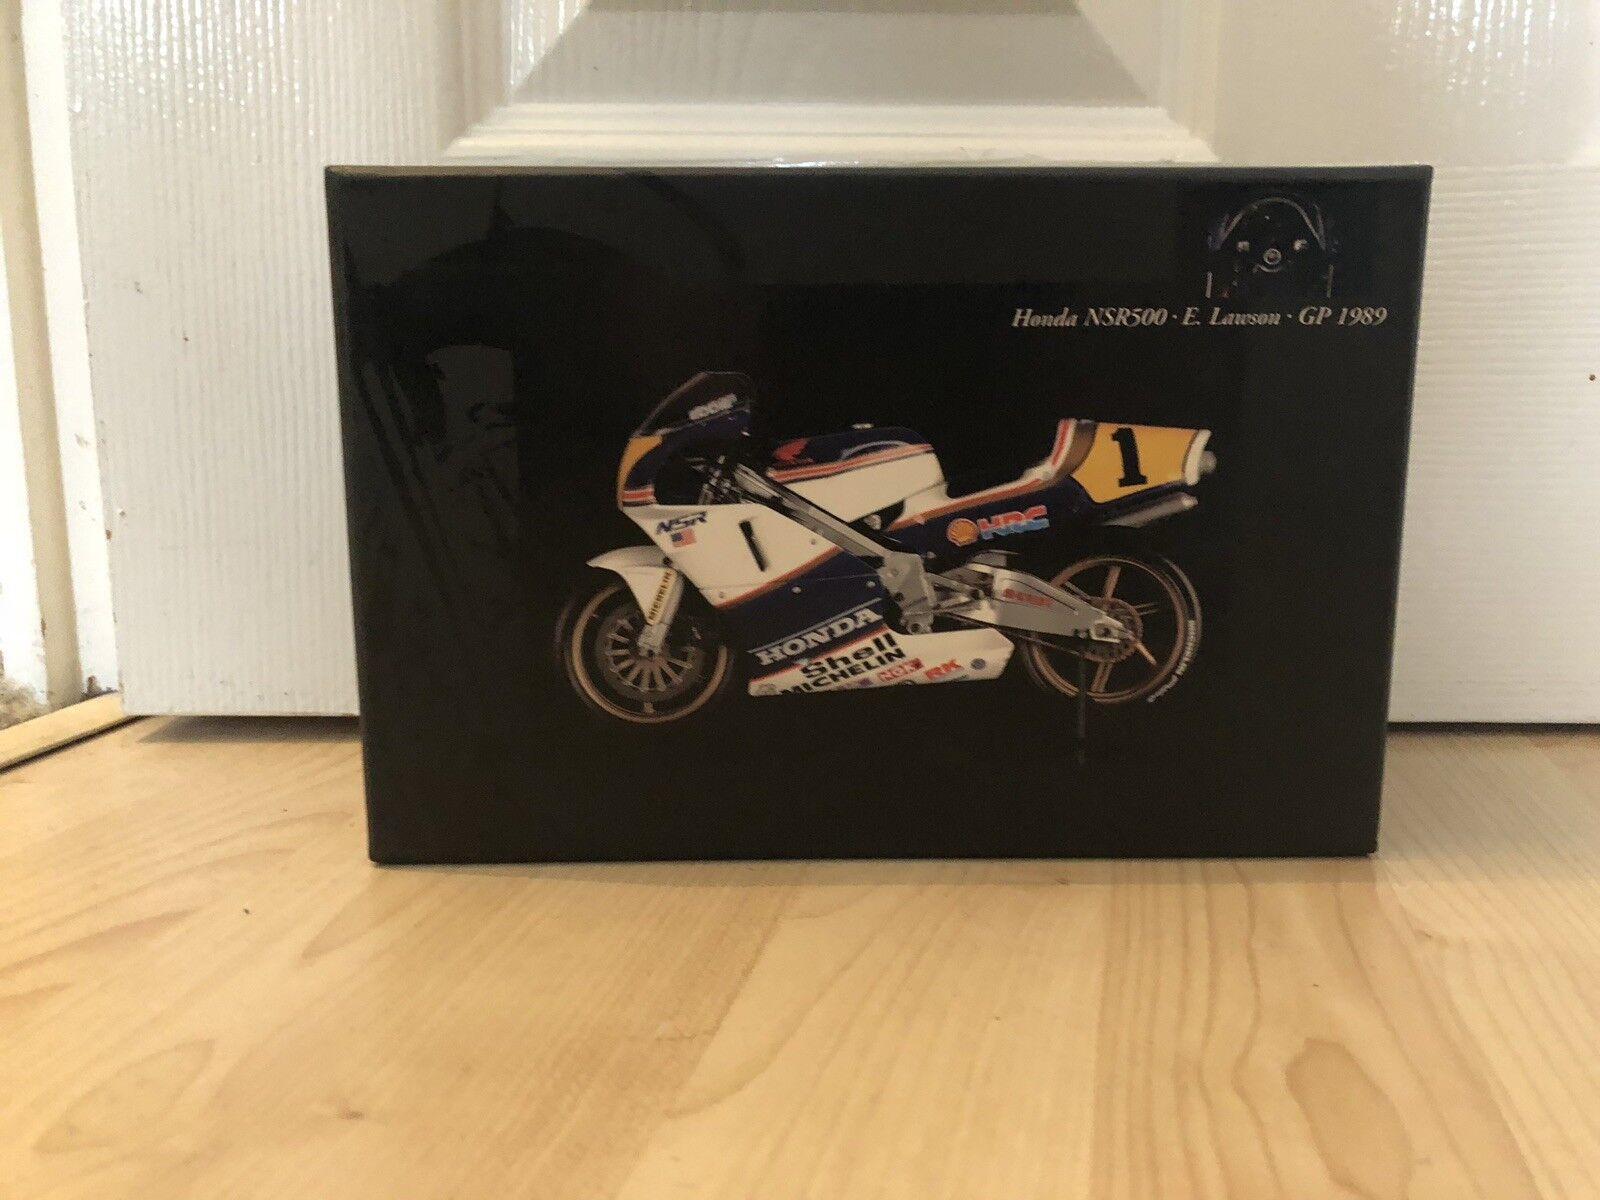 Minichamps 1:12 HONDA NSR 500 EDDIE LAWSON GP 1989 MEGA RARO NUOVO ROTHMANS Decalcomanie